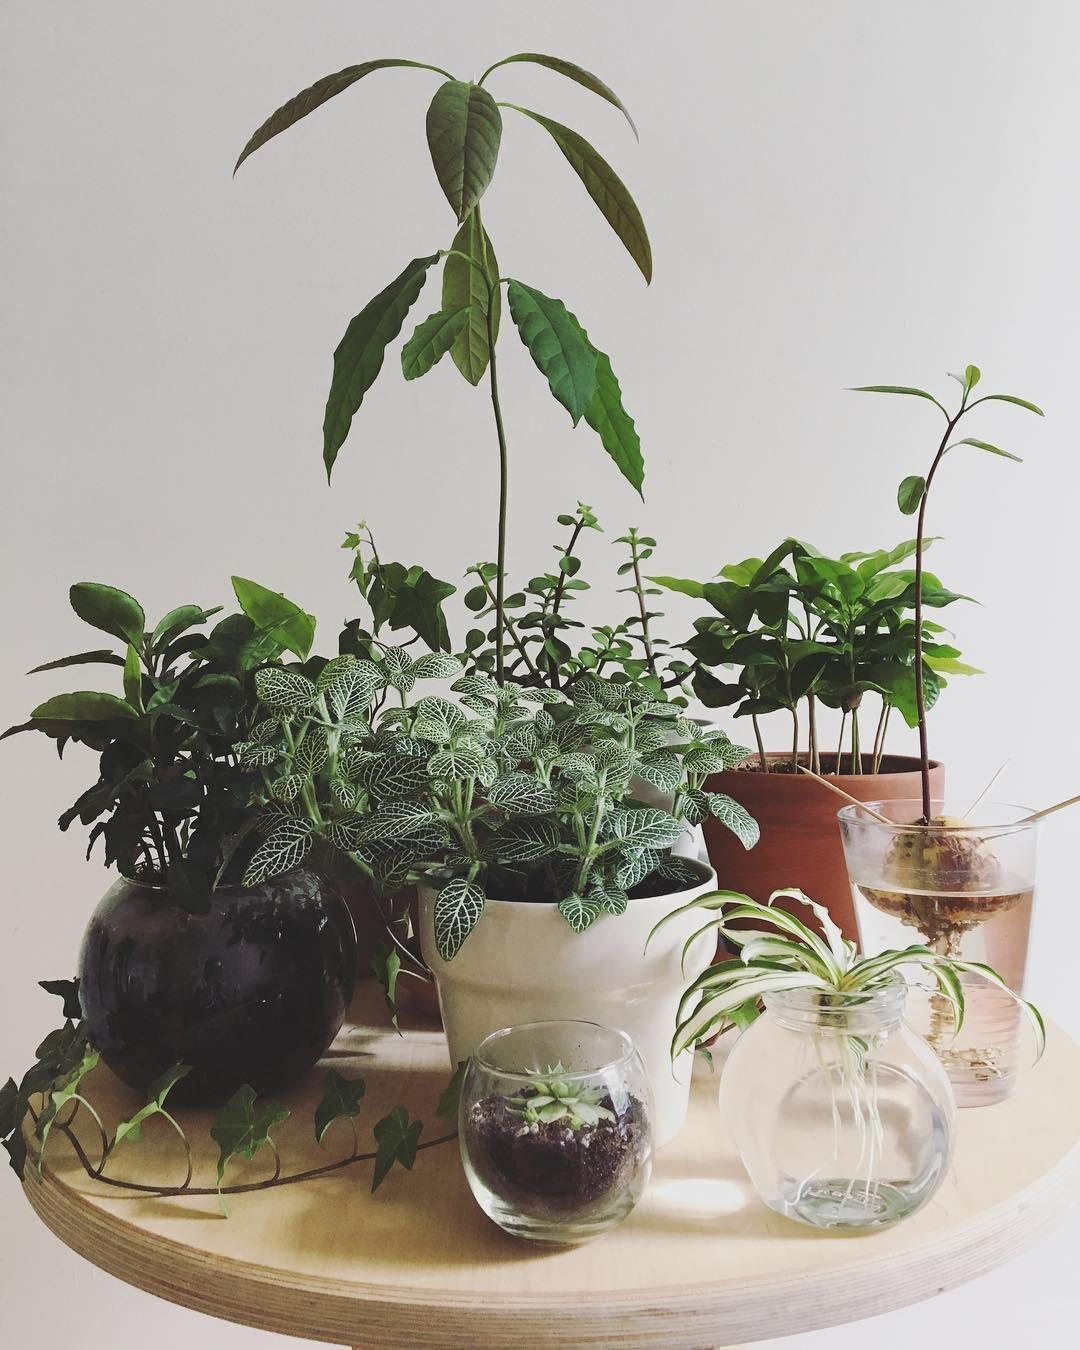 "236 curtidas, 8 comentários - Guillaume (@guscharron) no Instagram: ""Damn I love plants #houseplants #indoorplants #plants #plantslover #plantsofinstagram…"""